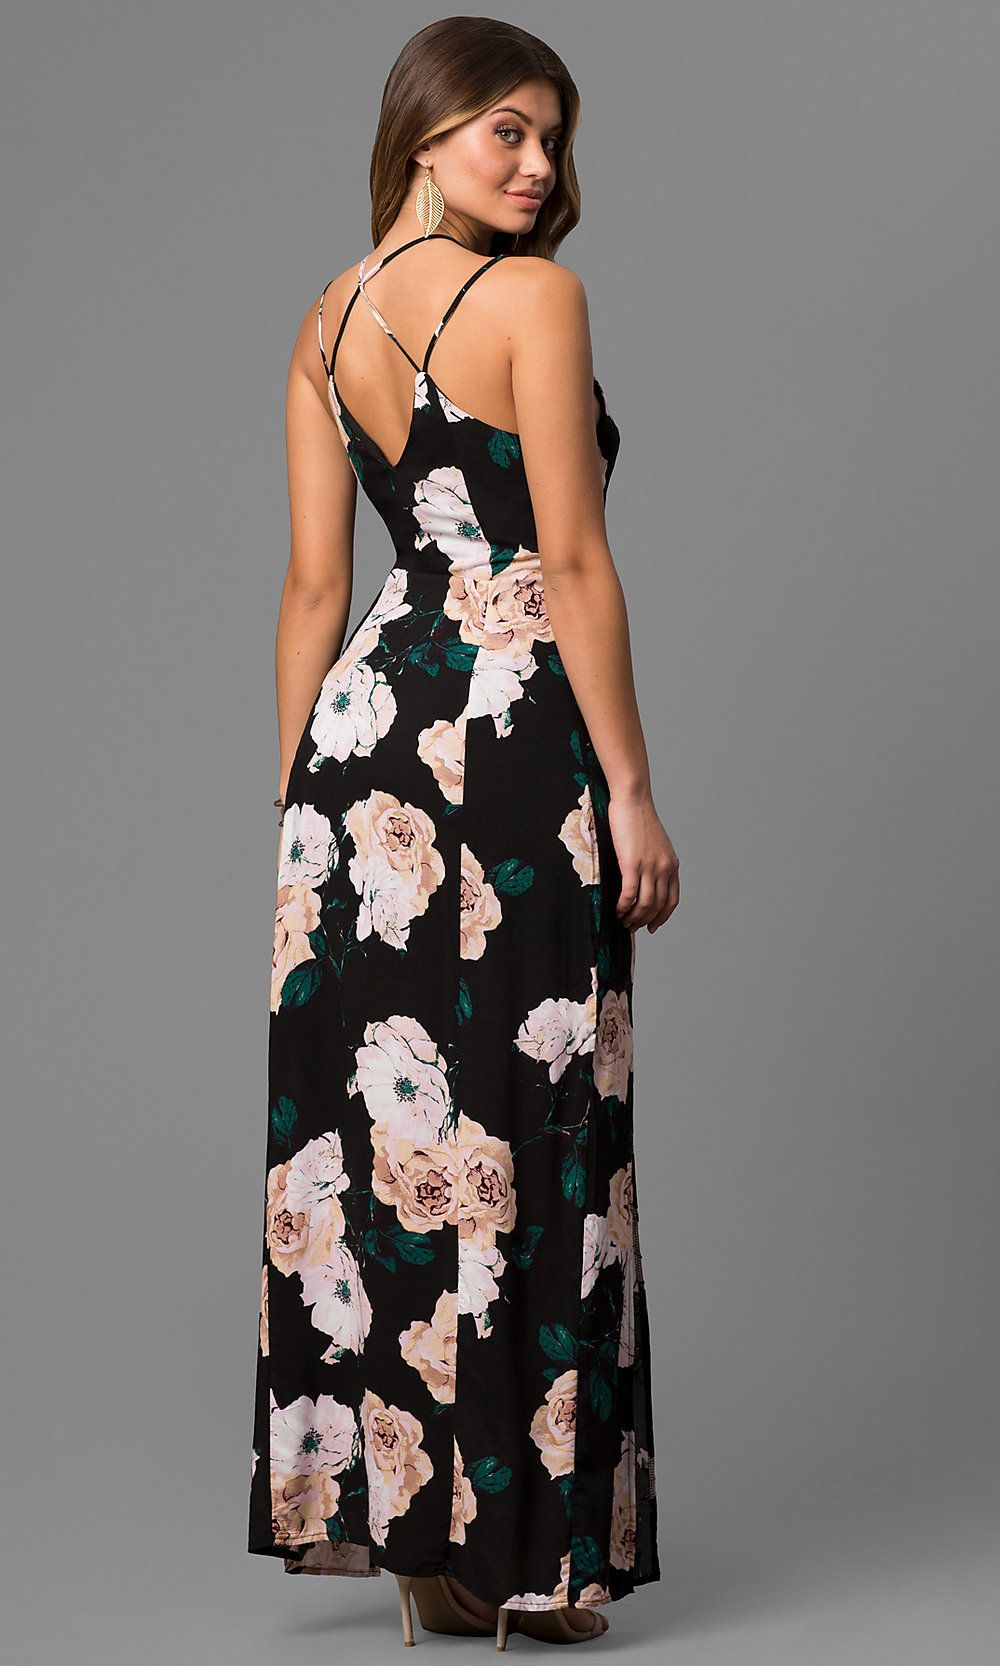 Prom Dresses, Plus-Size Dresses, Prom Shoes - PromGirl: DQ